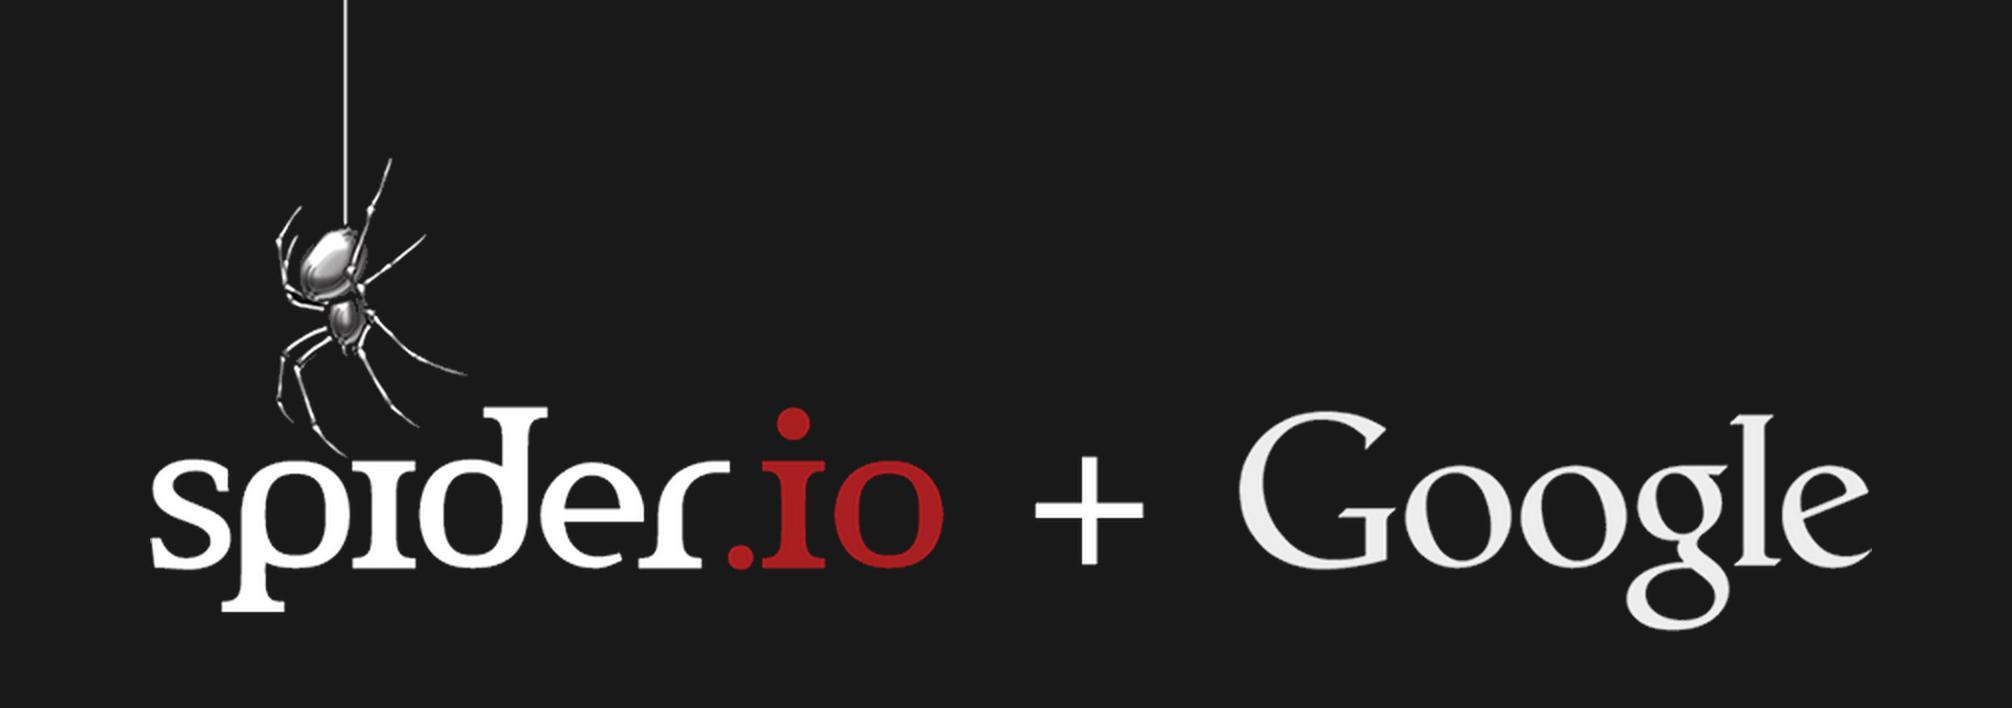 spider-io-google